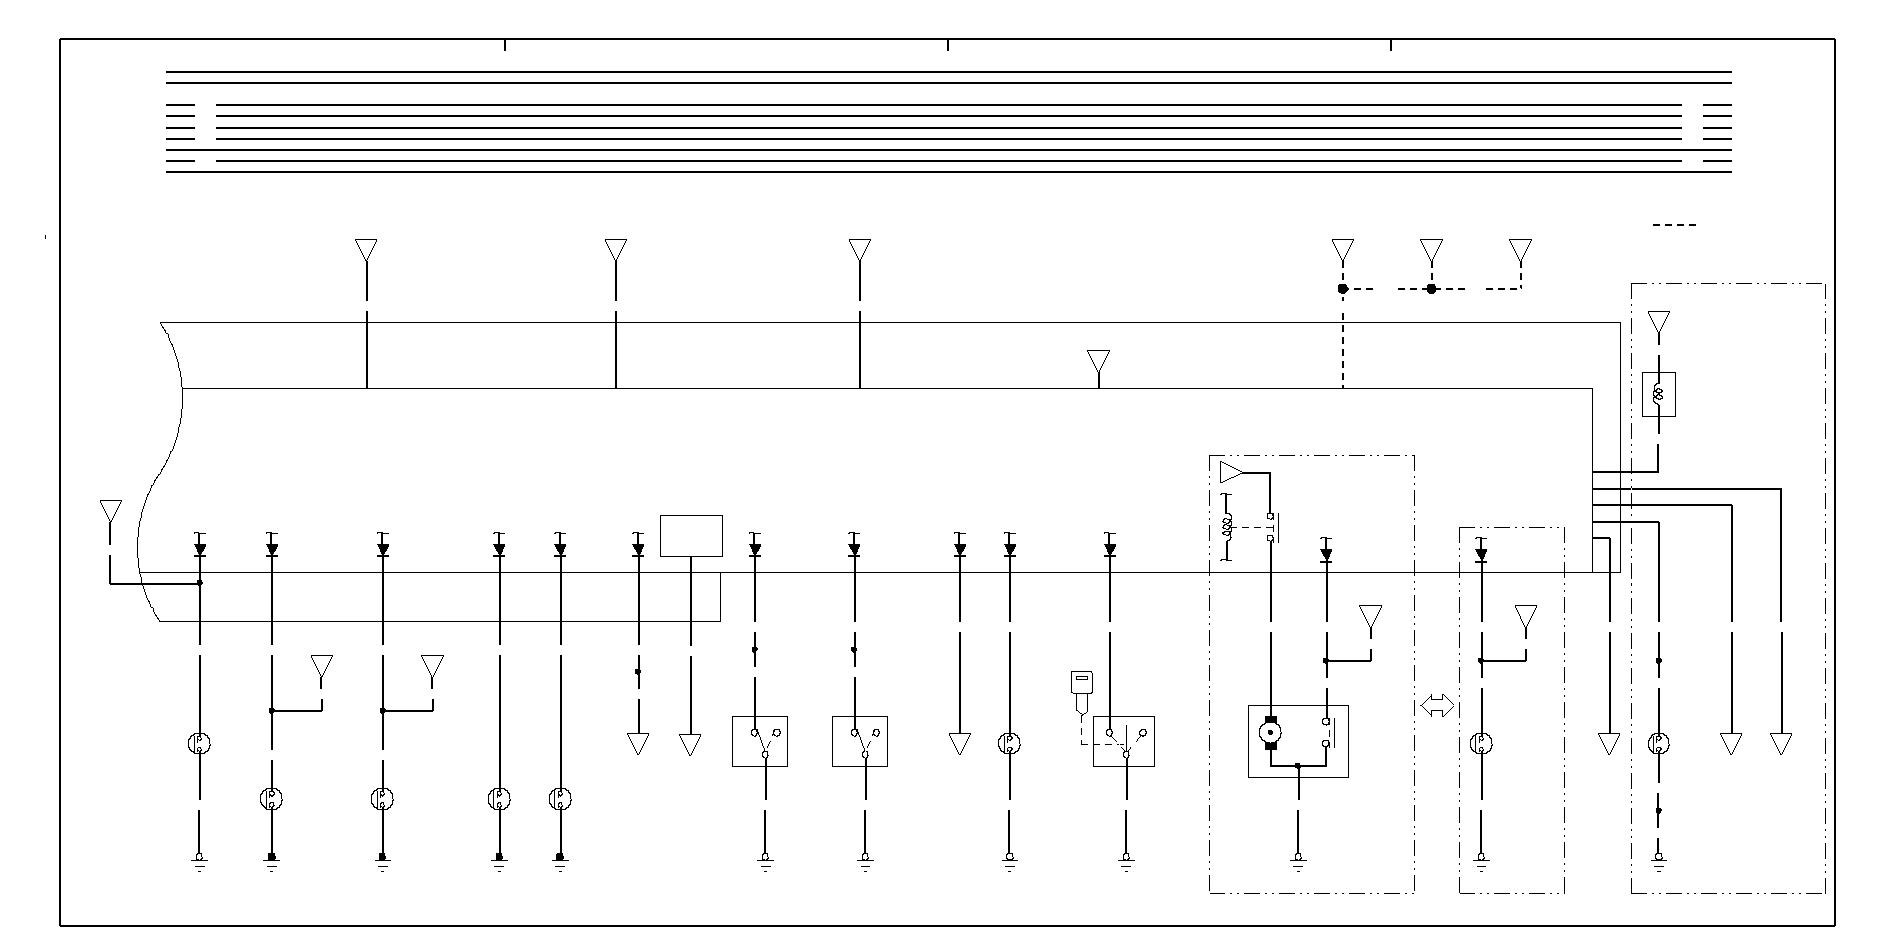 SNB6E00000000000000EBAD13?resize\\\\\\\=665%2C333 2008 mazda 3 wiring diagram wiring diagram shrutiradio Mazda 3 Headlight Replacement Diagram at mifinder.co